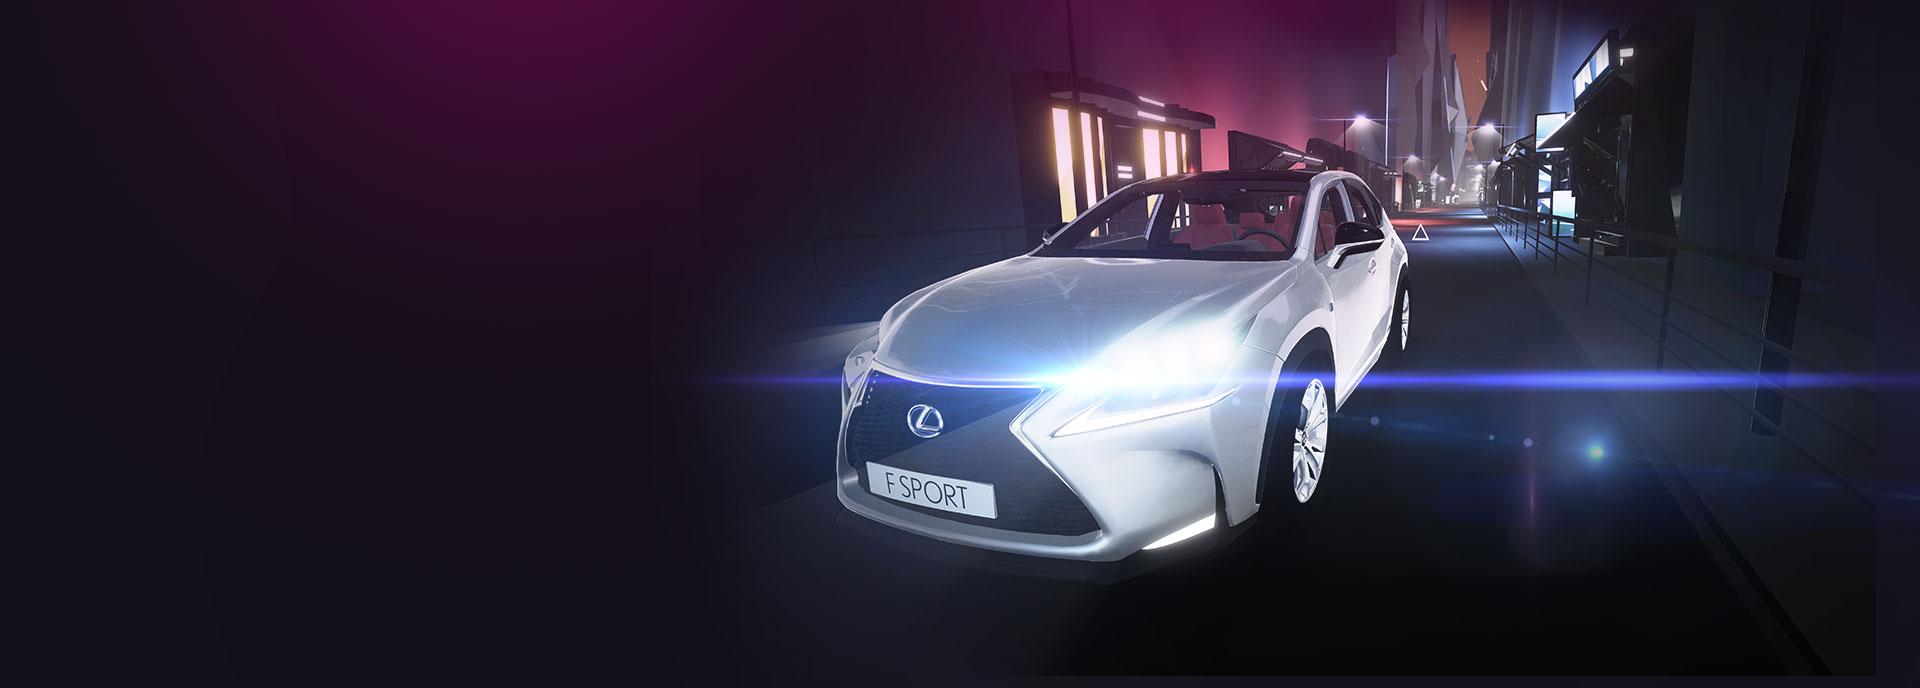 nx300h-drive